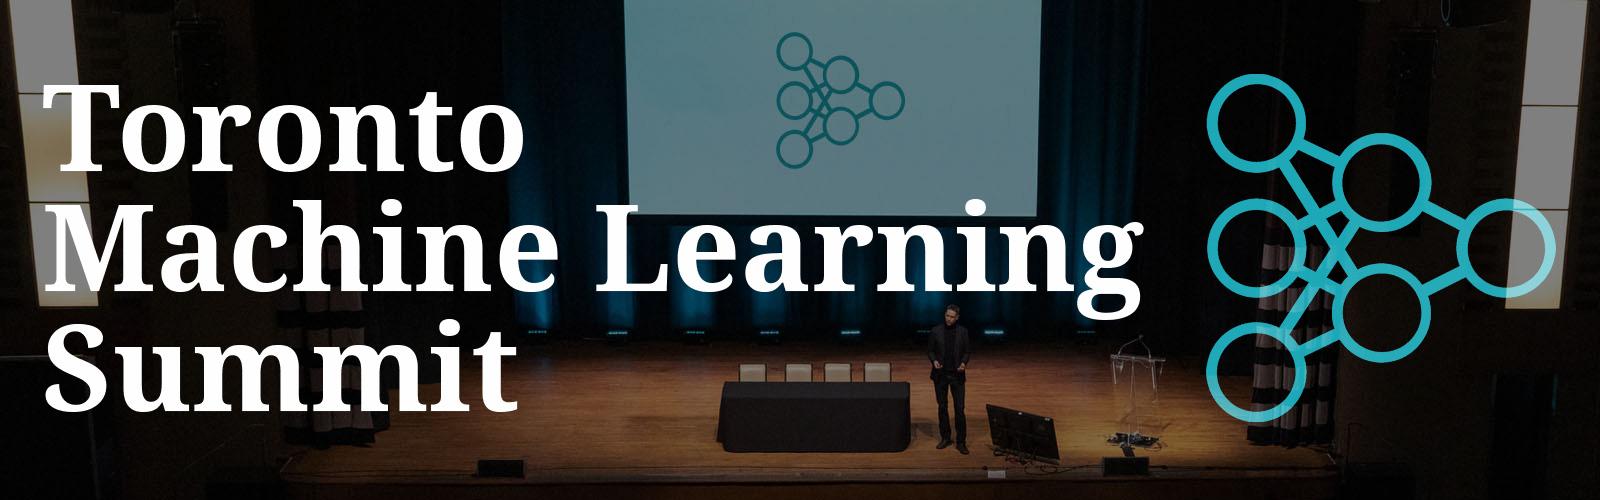 Toronto Machine Learning Summit